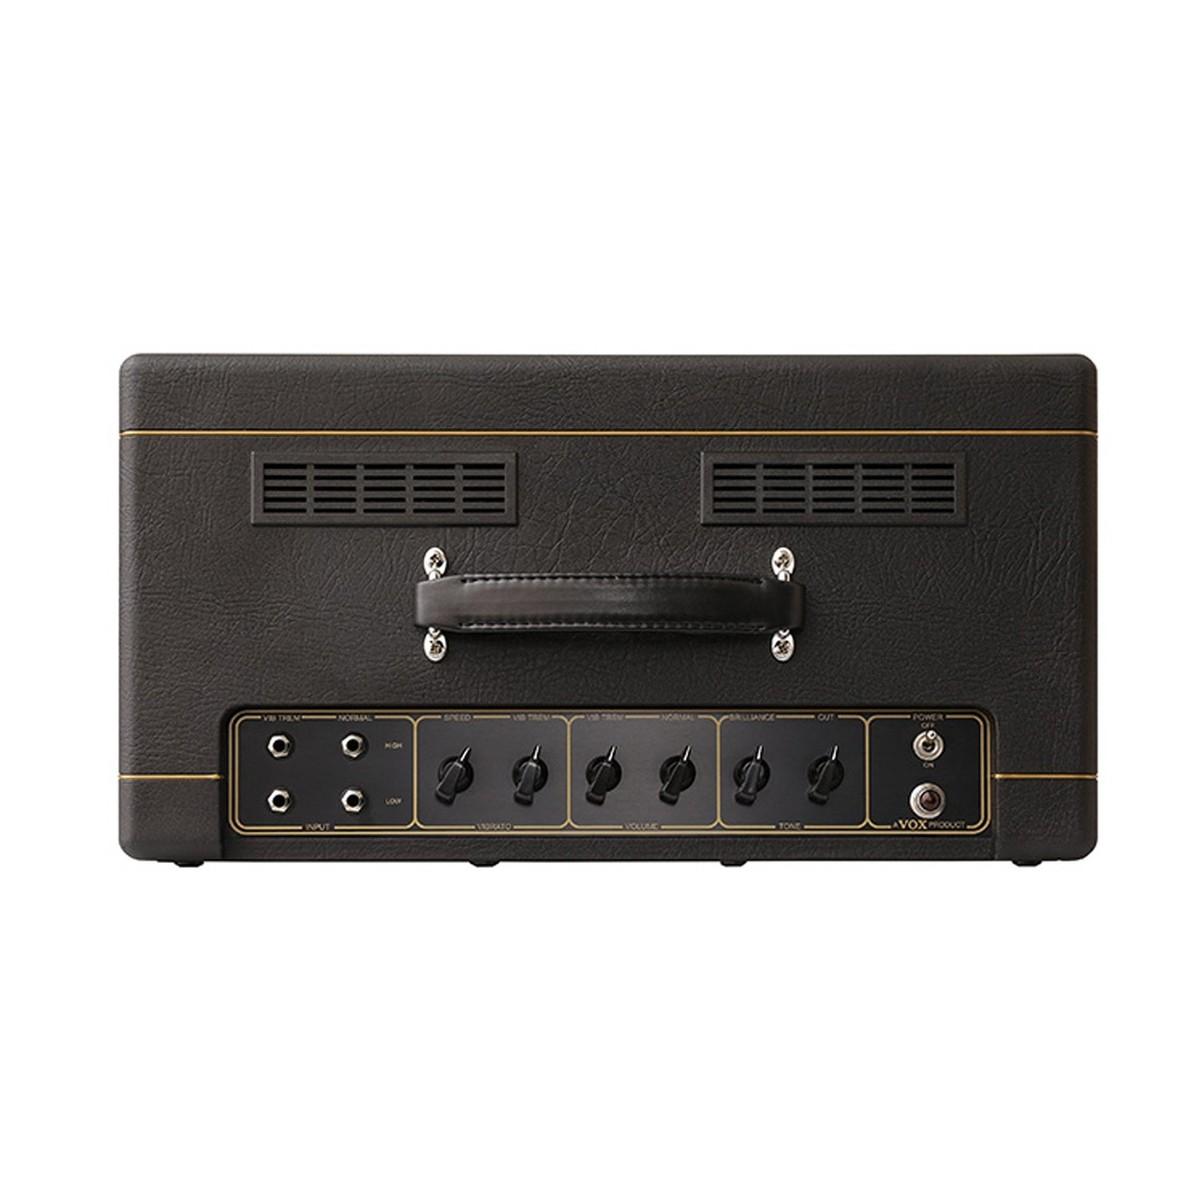 Vox AC15HW60 60. Anniversary Hand verdrahtet Combo bei Gear4music